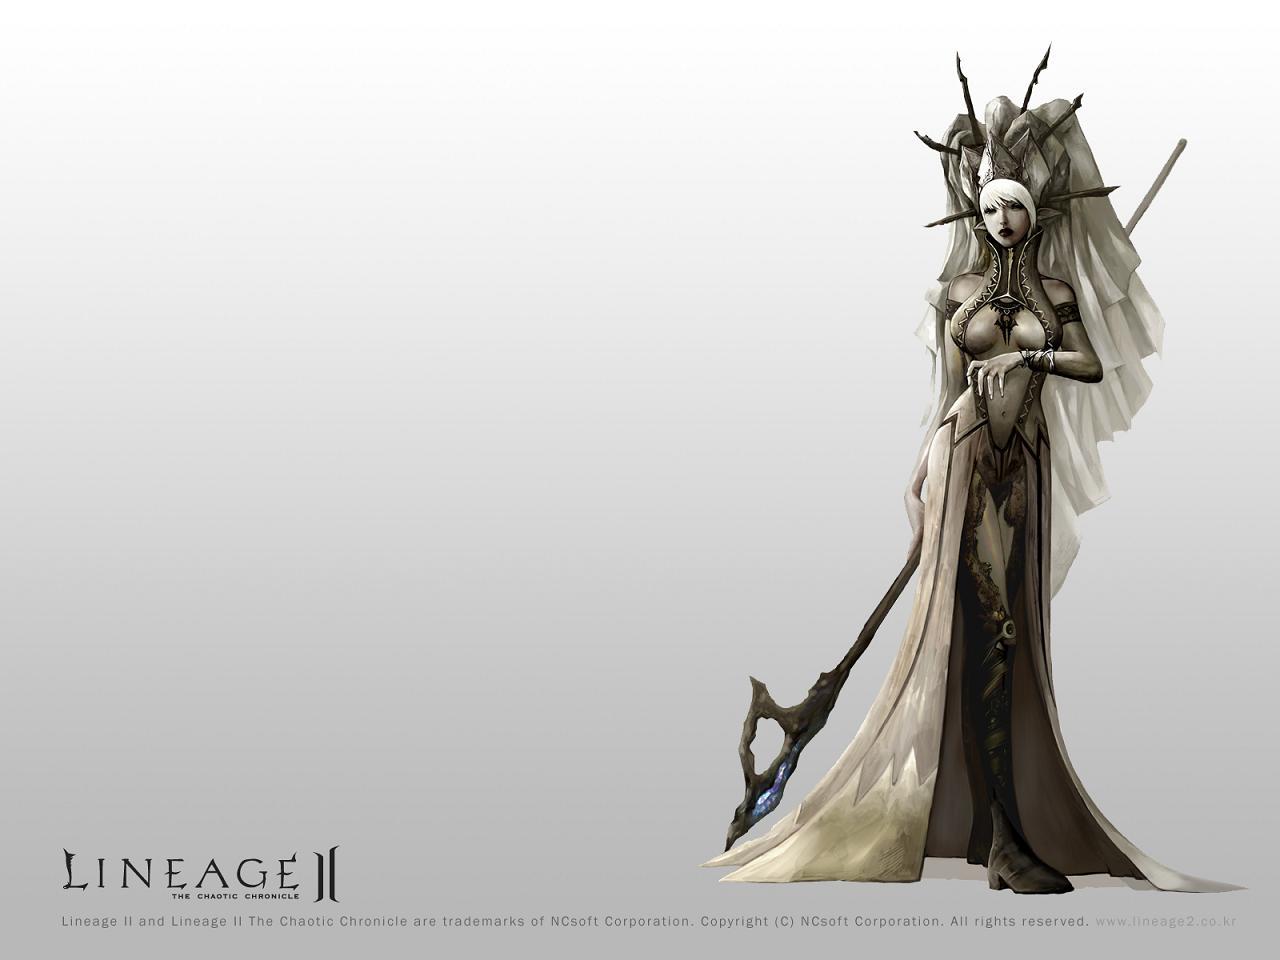 Female Dark Elf Mage Wallpapers   HD Wallpapers 12477 1280x960